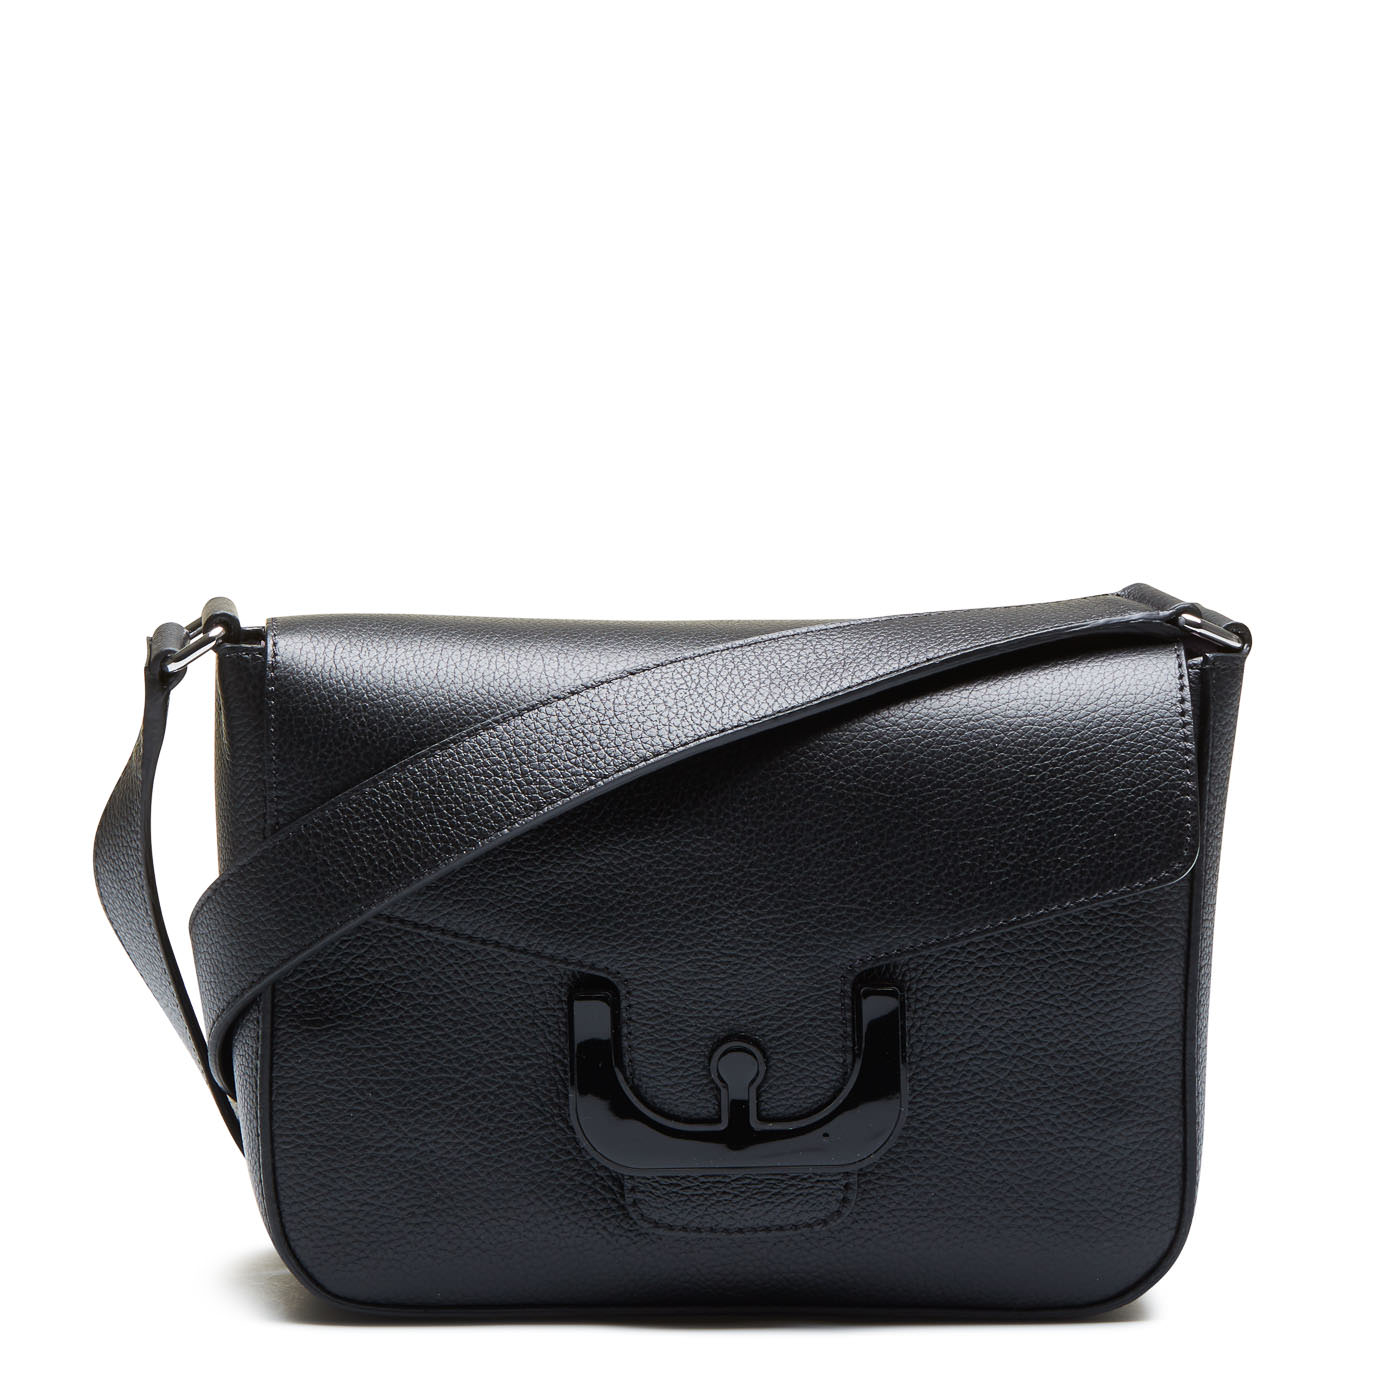 22a71ccd4f09 Image of Coccinelle Ambrine Noir Crossbody Bag DJ5150101001TU